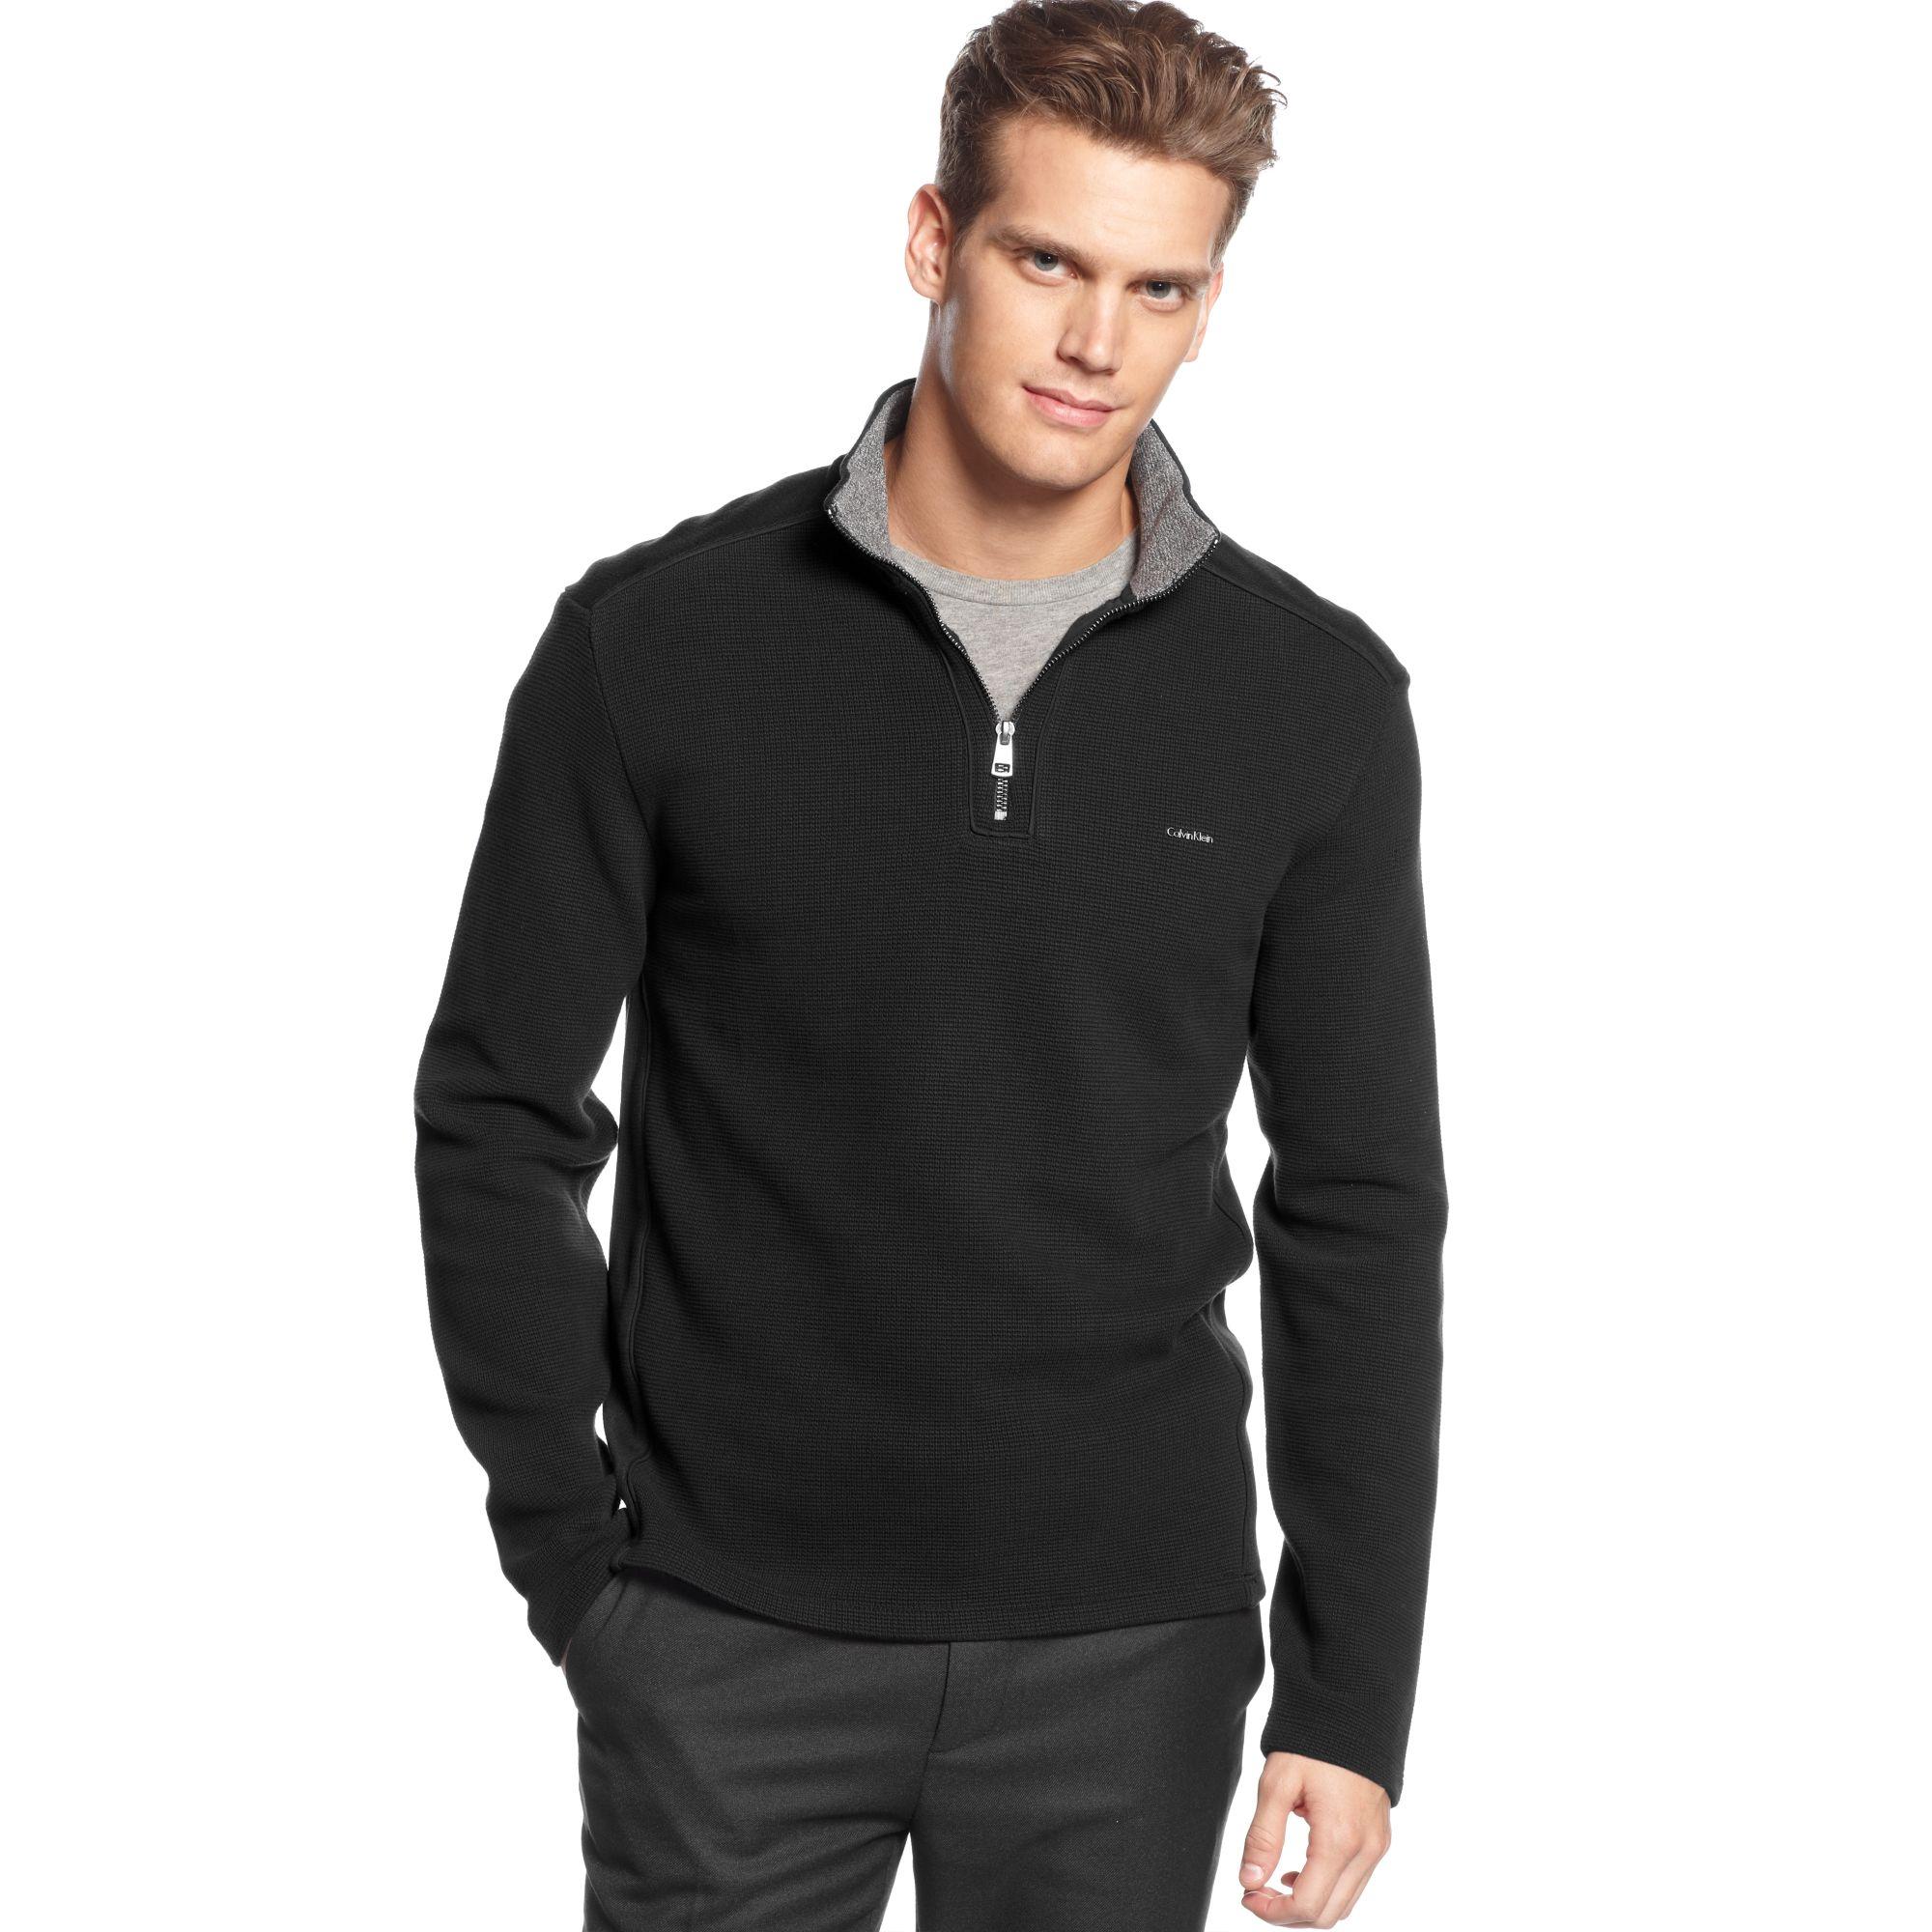 calvin klein quarter zip jacquard pullover sweater in. Black Bedroom Furniture Sets. Home Design Ideas